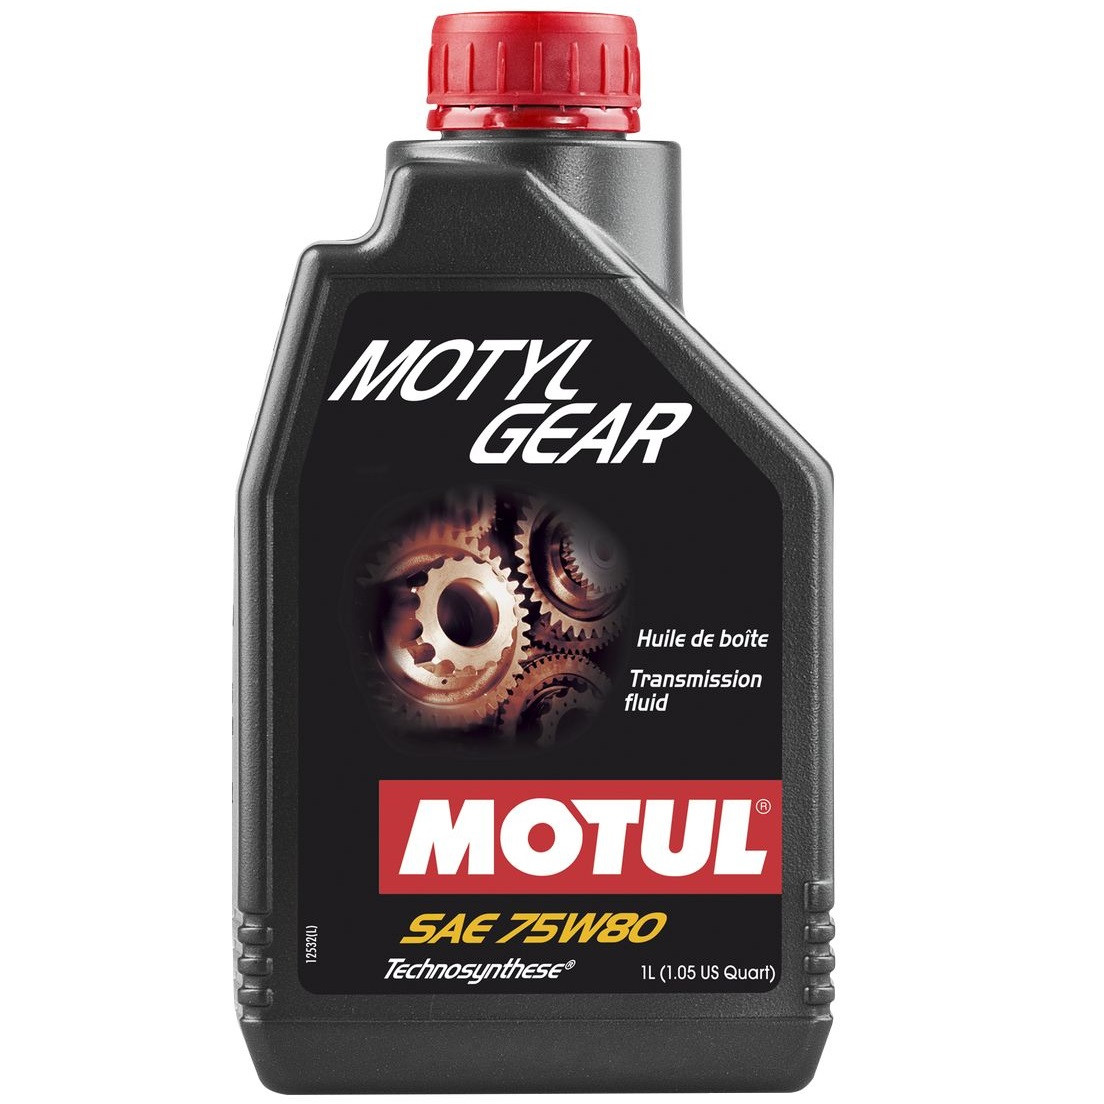 Масло трансмиссионное Technosynthese MOTUL Motylgear SAE 75W80 1л. 105782/823401